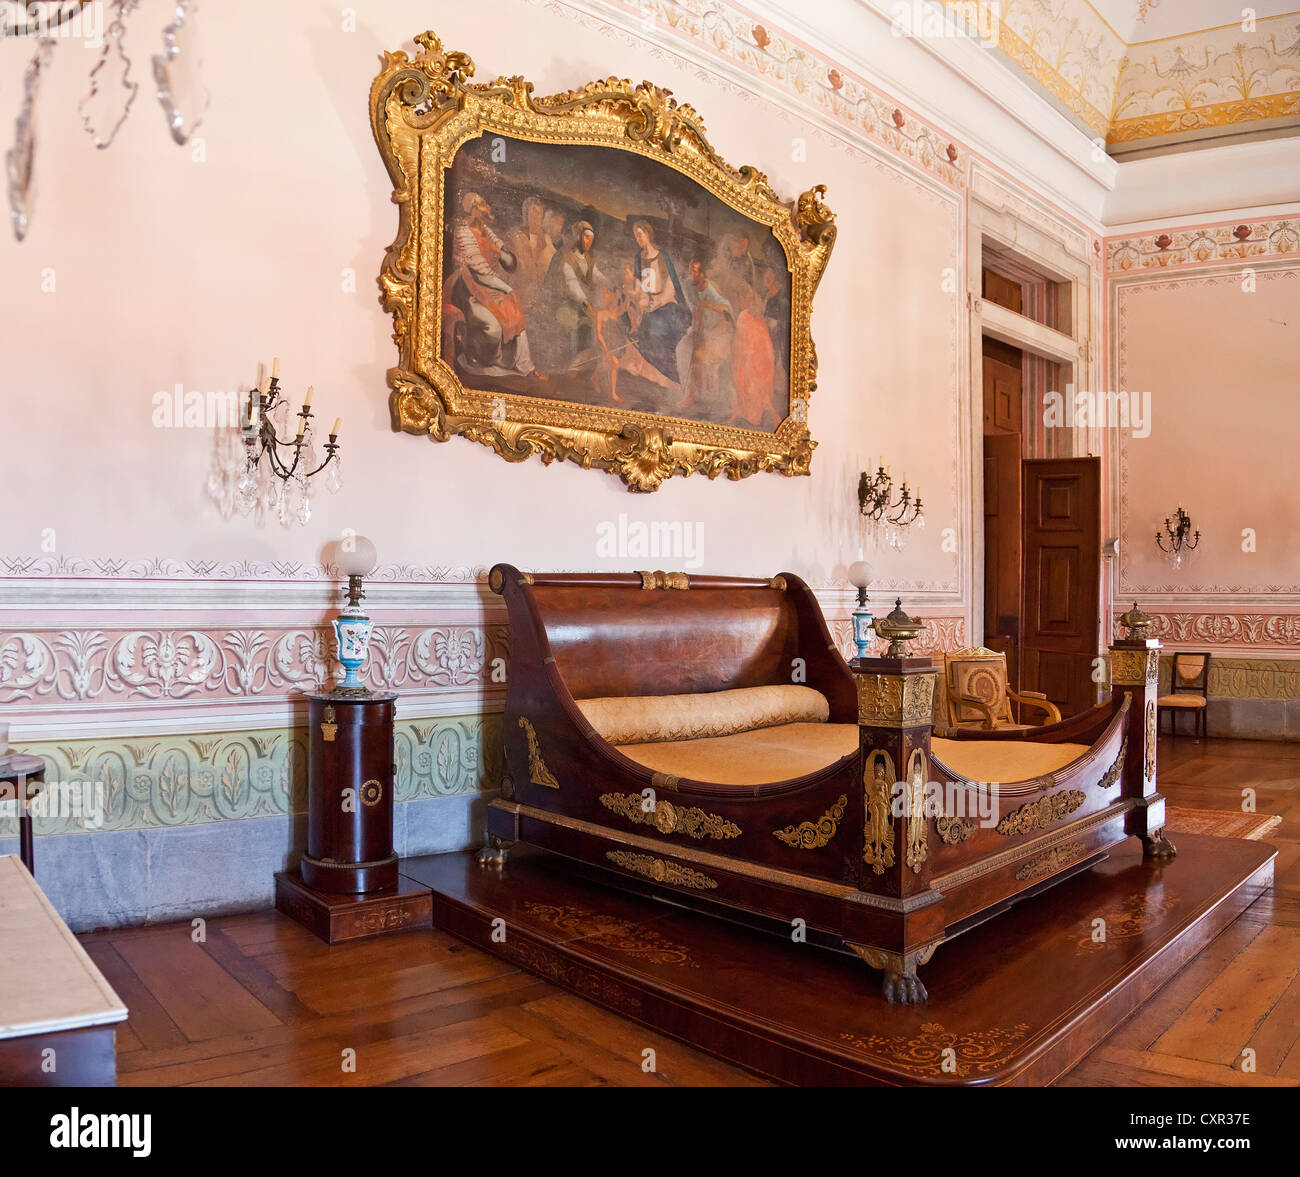 Baroque Furniture Stock Photos & Baroque Furniture Stock